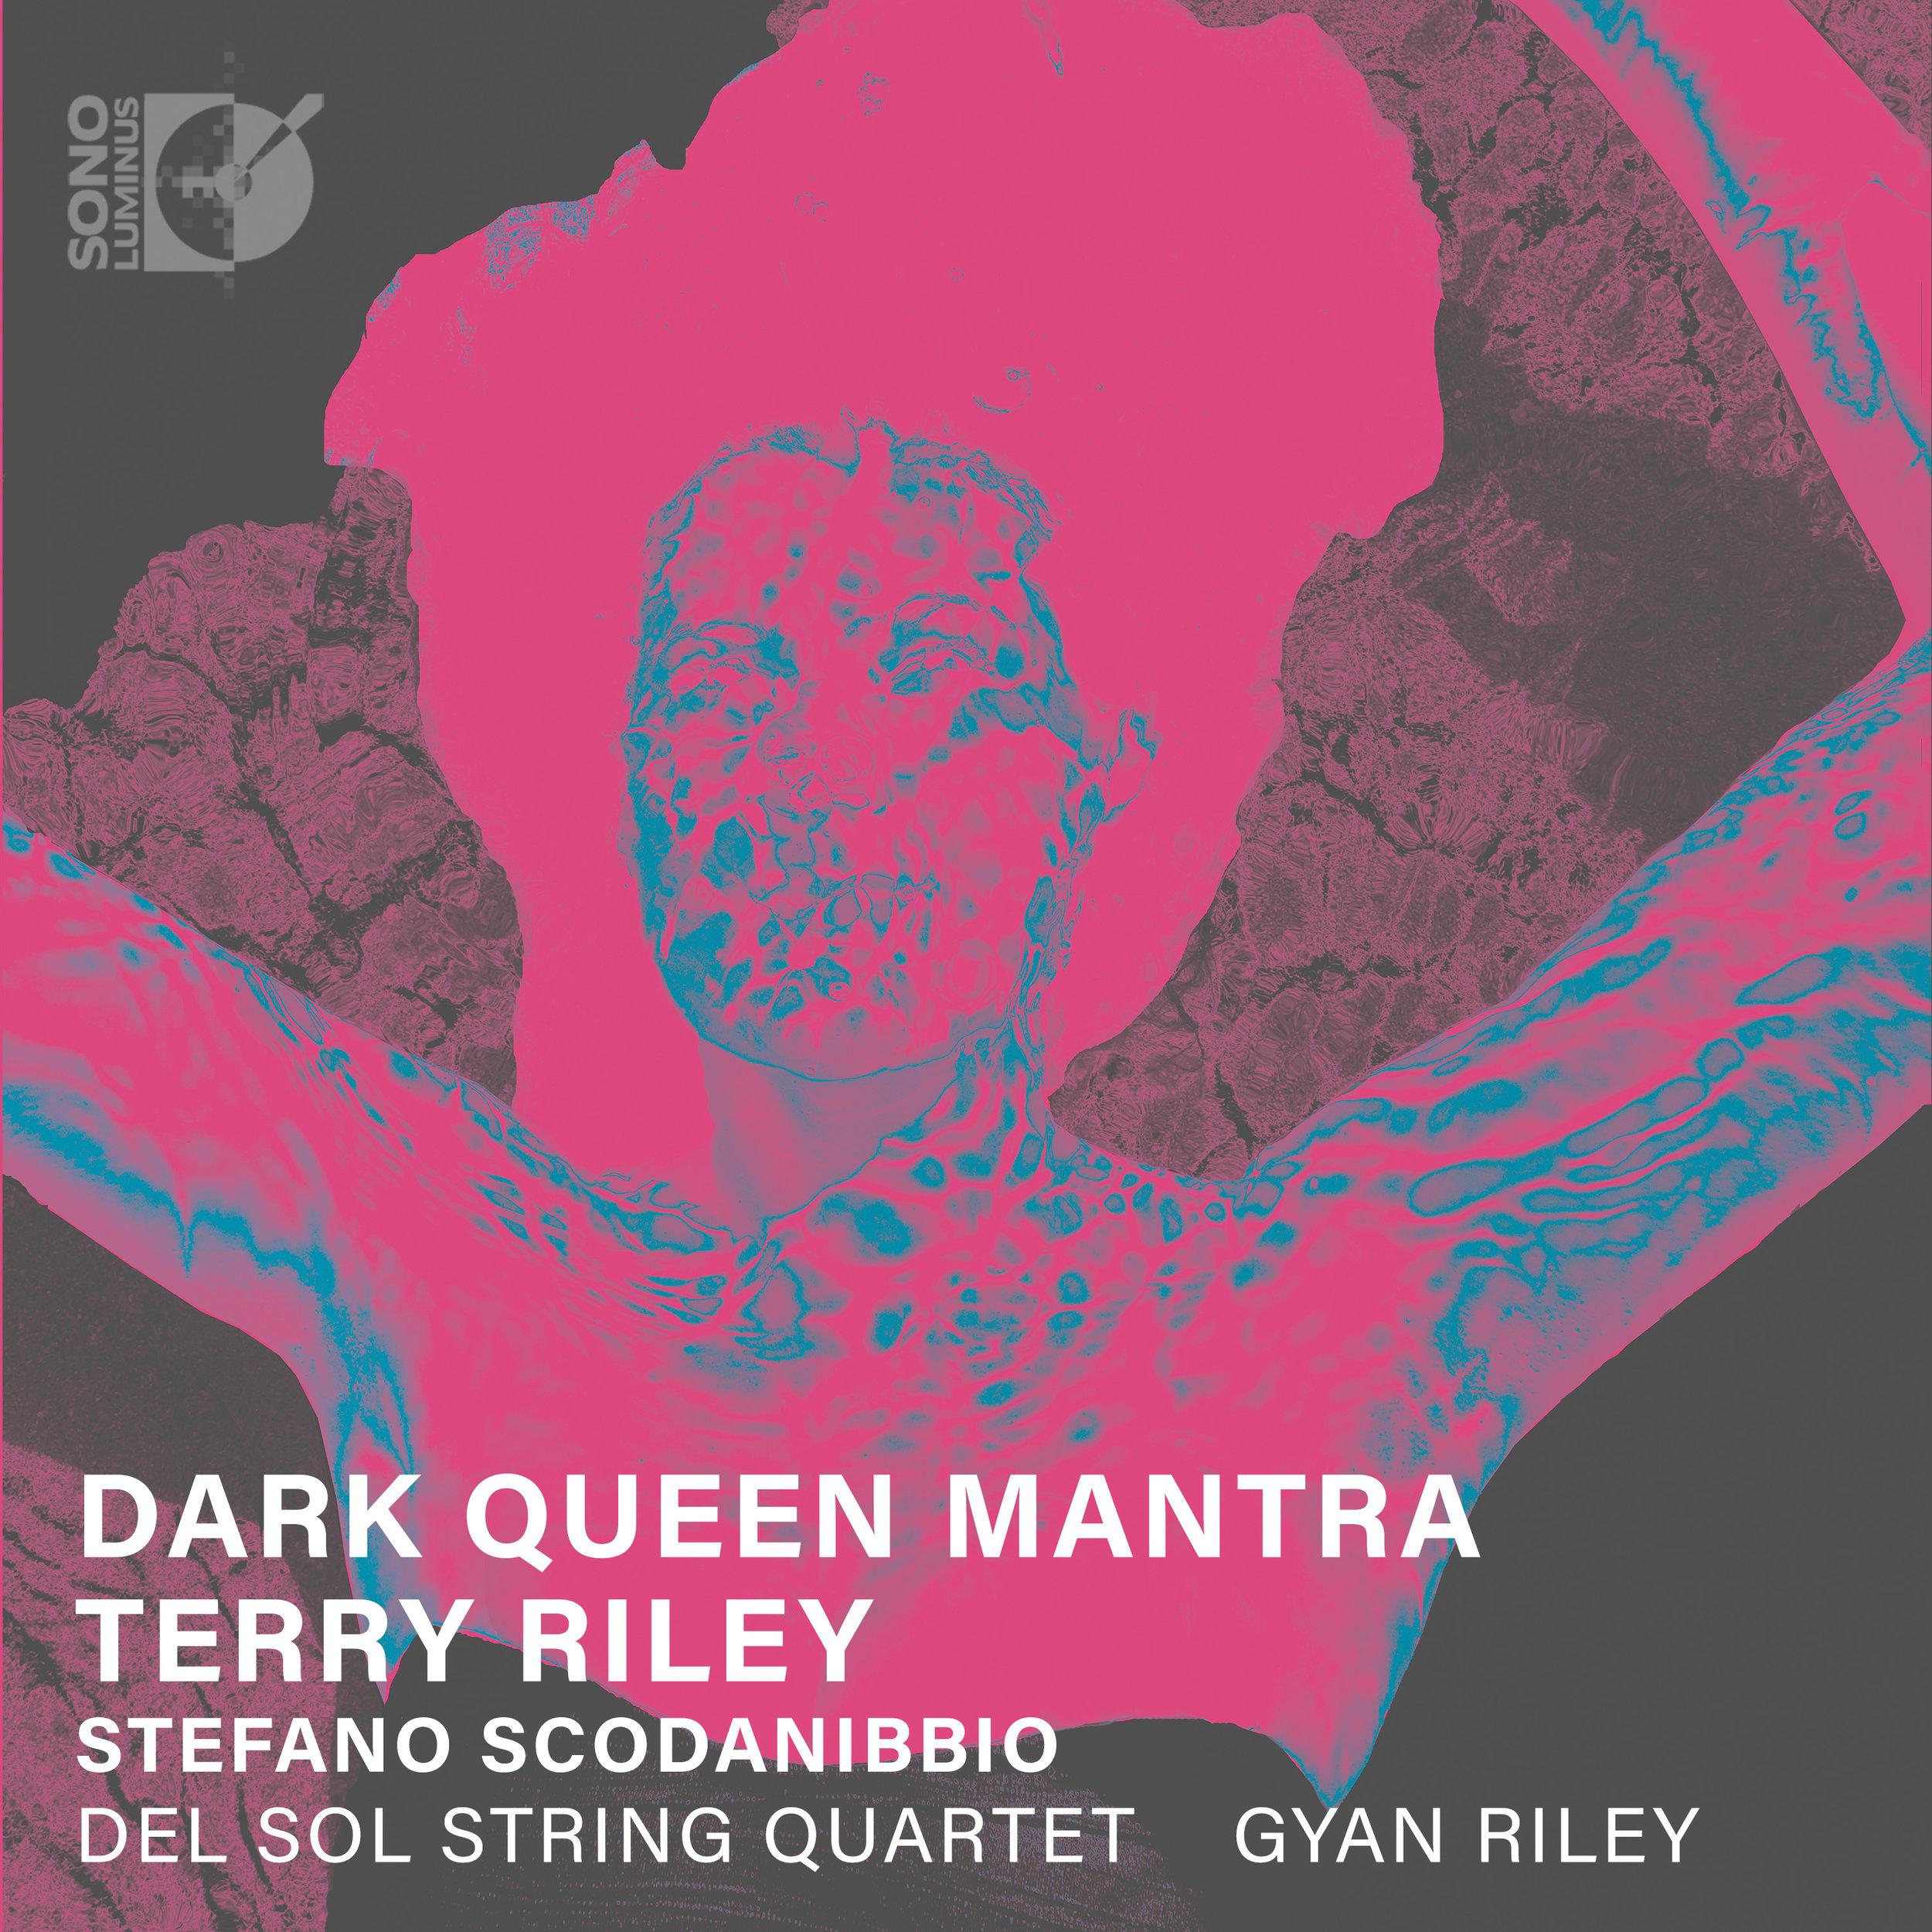 Dark Queen Mantra